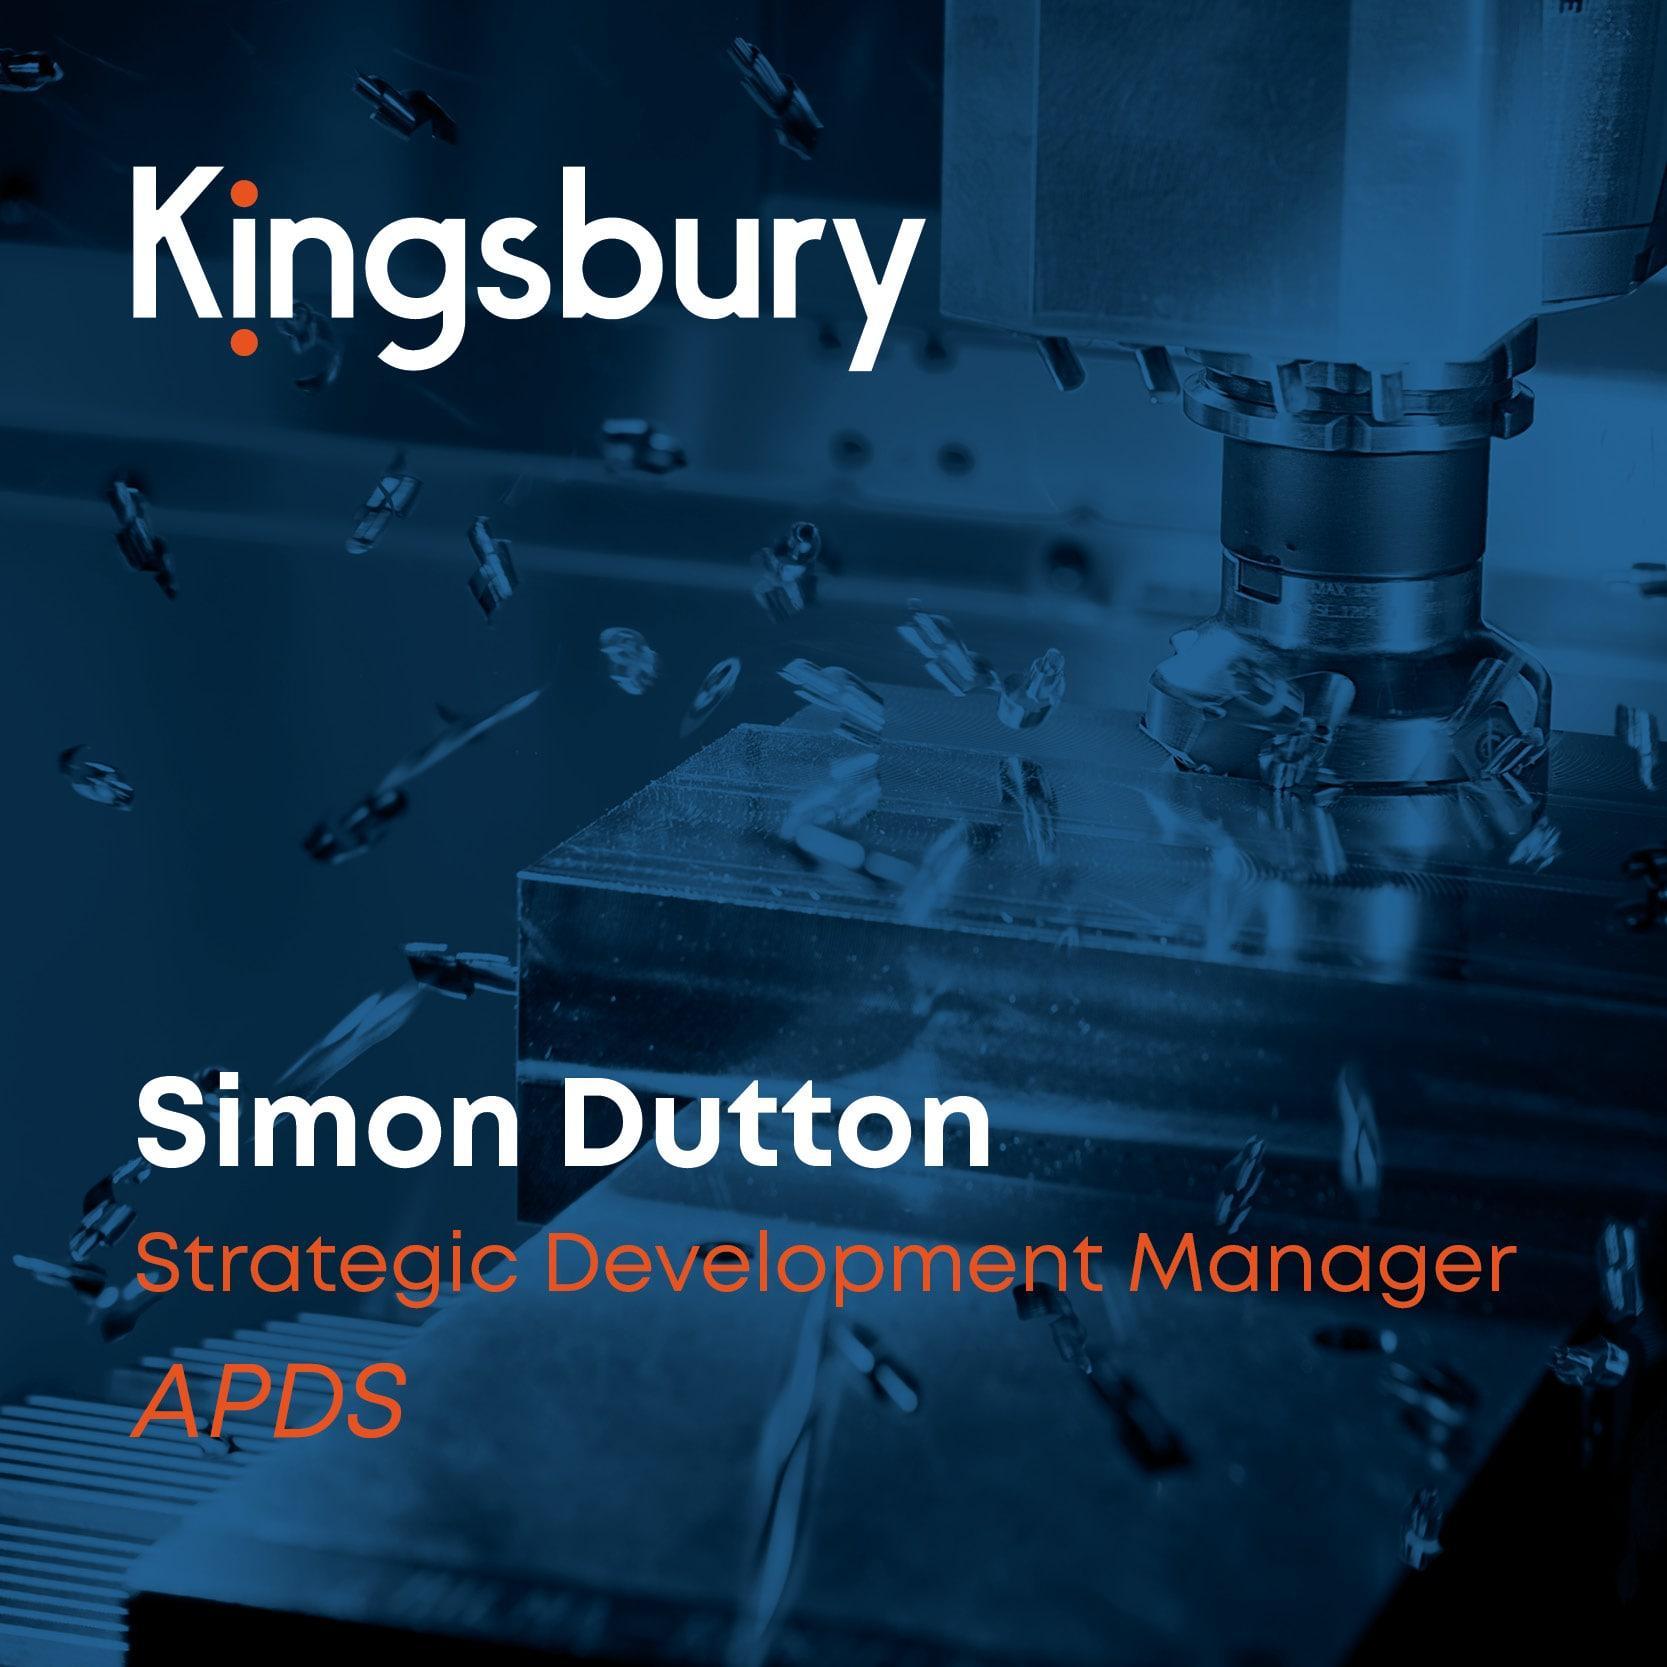 Simon Dutton strategic development manager at APDS